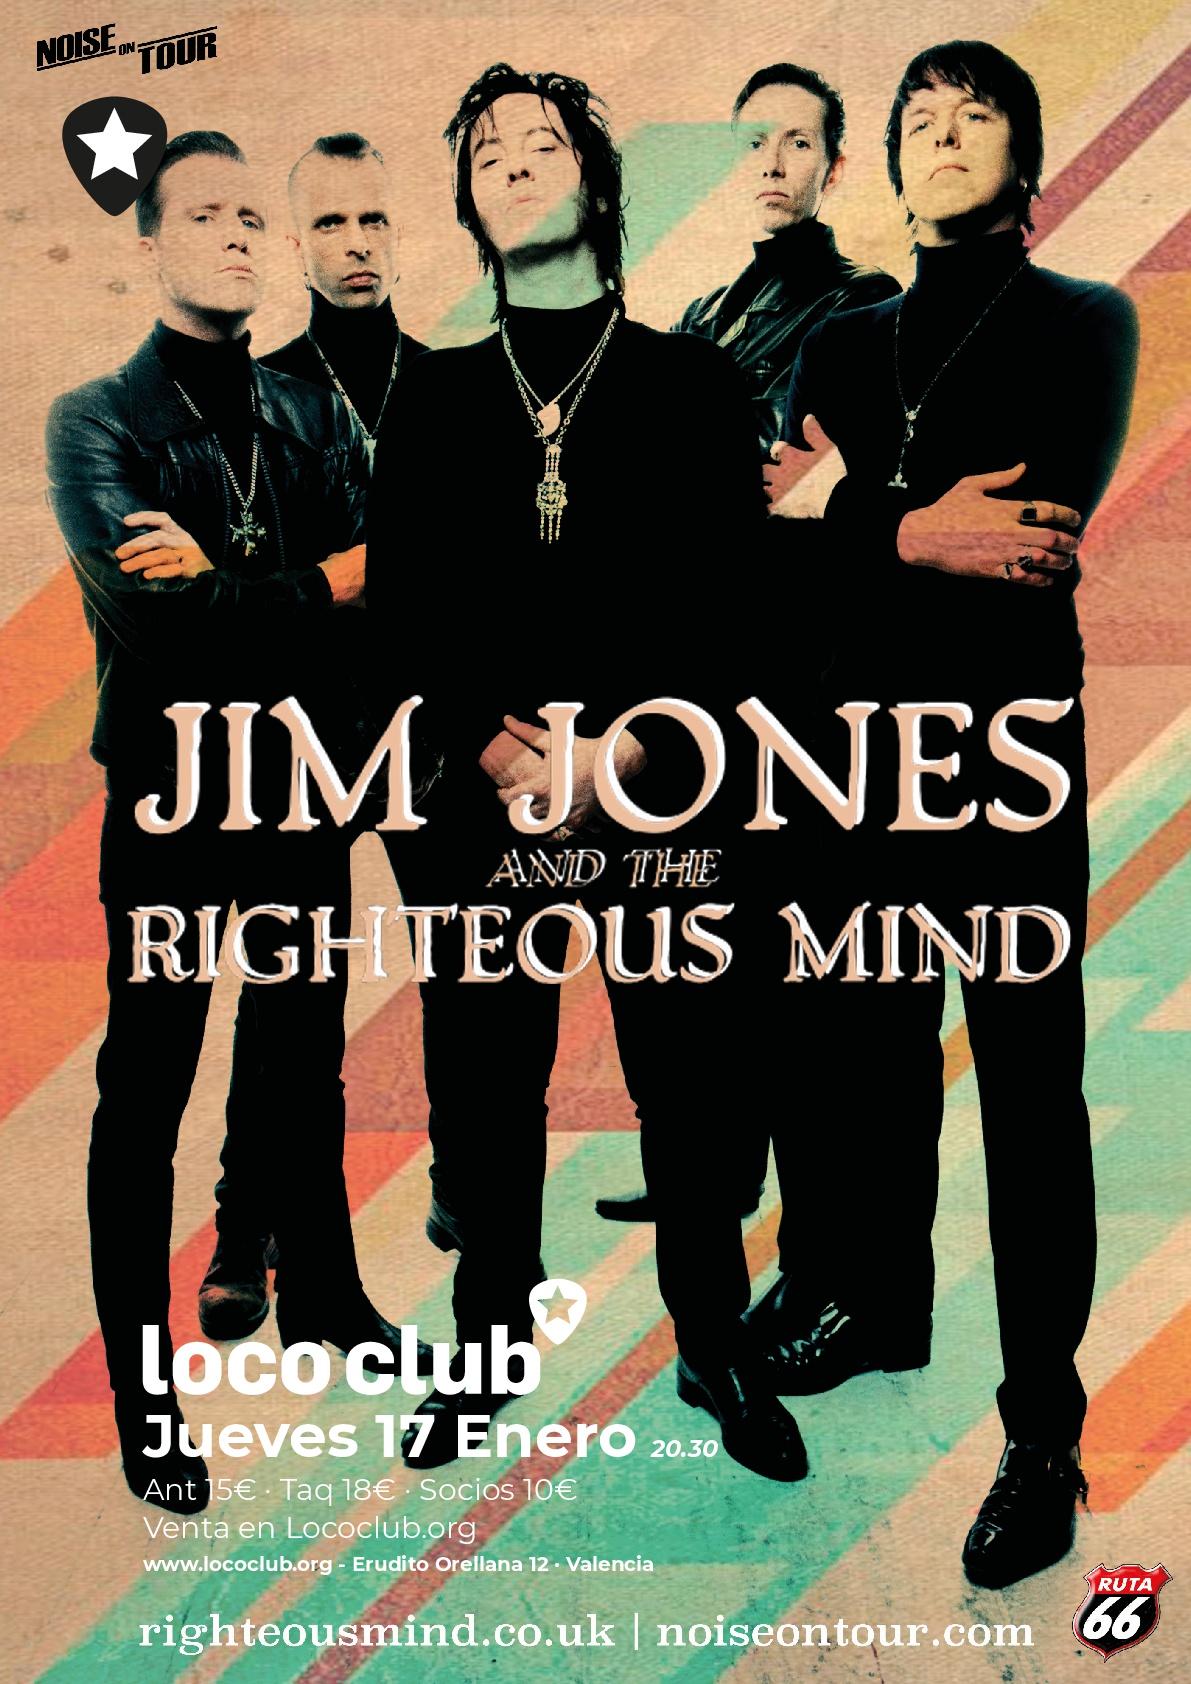 JIM JONES AND THE RIGHTEOUS MIND LOCO CLUB 17 ENERO 2019 Cartel26